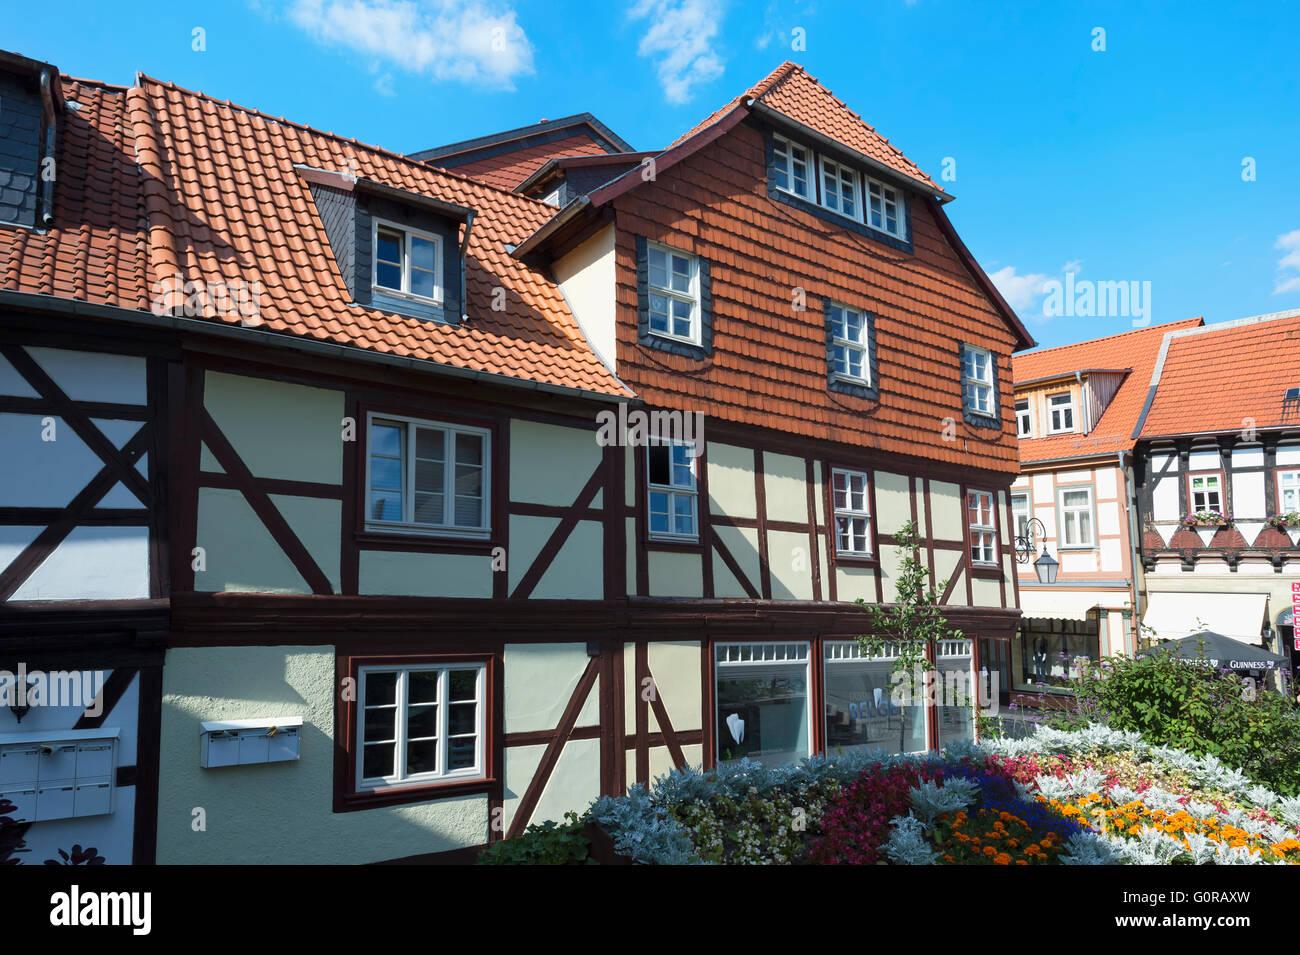 Half-timbered houses, Wernigerode, Harz, Saxony-Anhalt, Germany - Stock Image